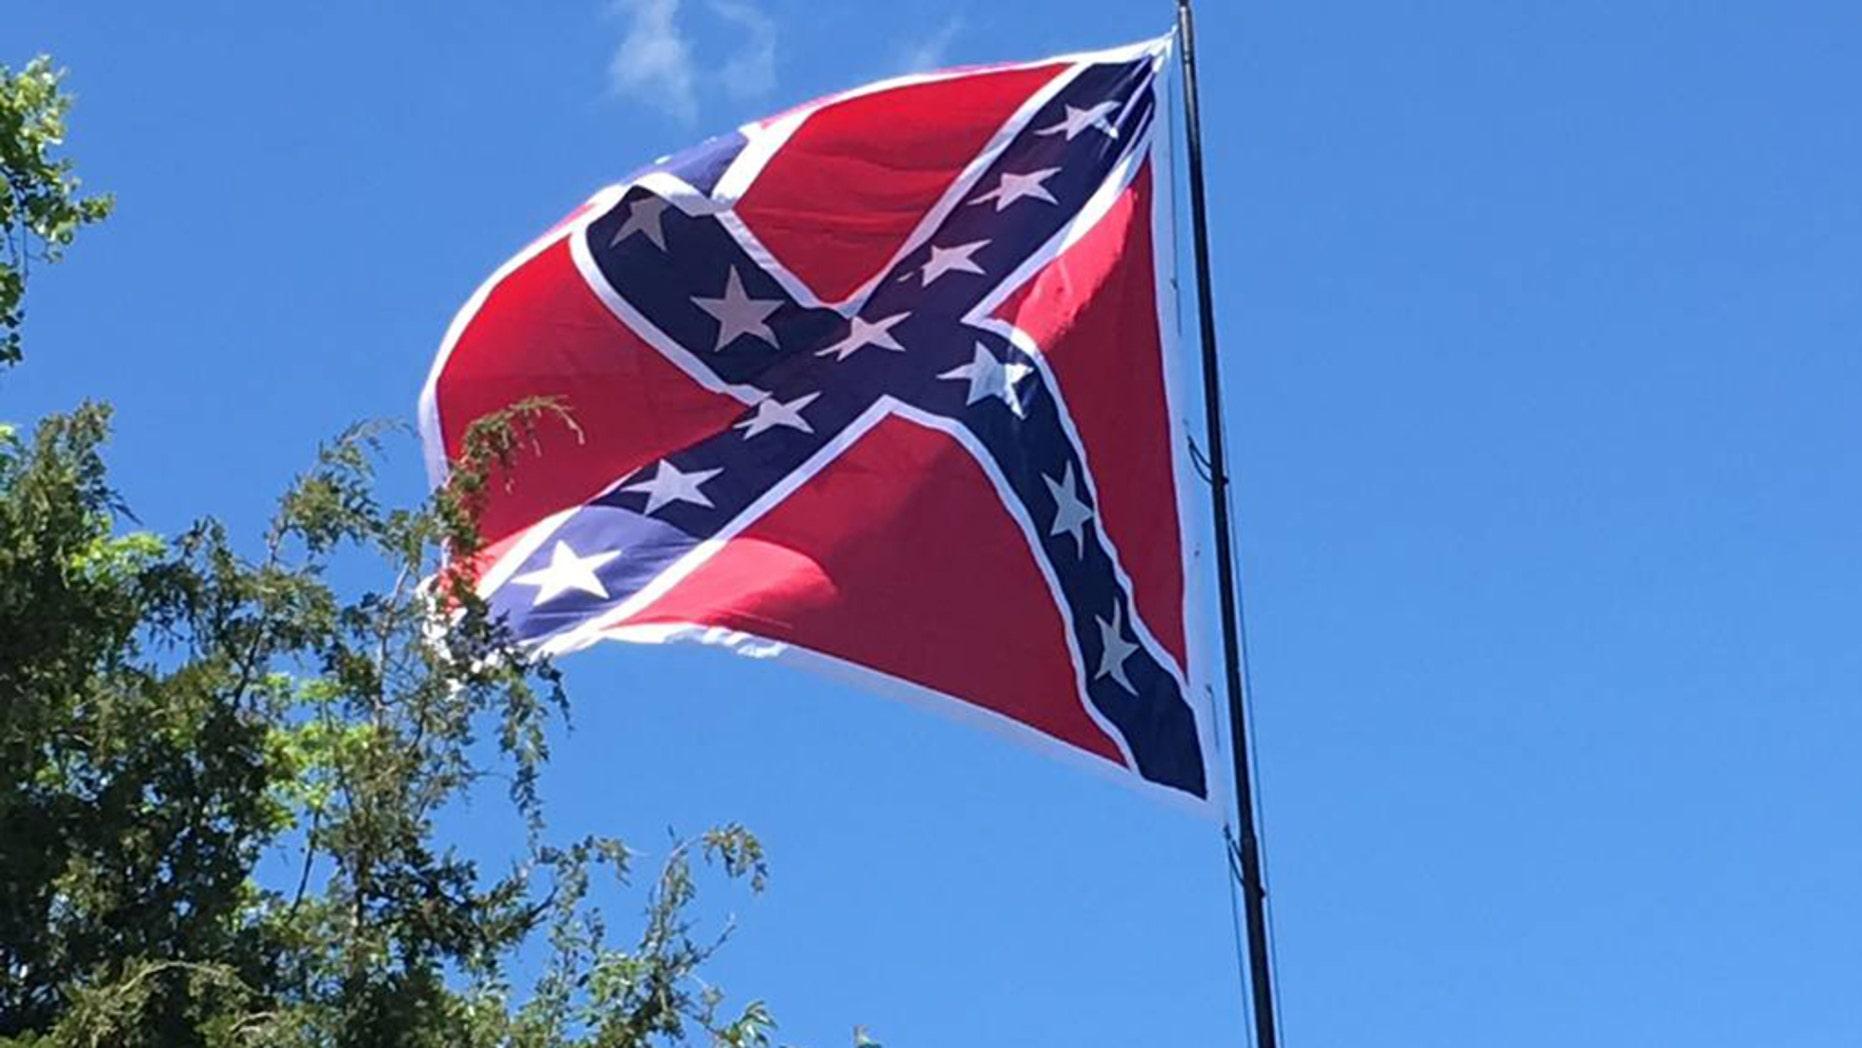 A Confederate flag flies over U.S. Highway 70 in Orange County, N.C.